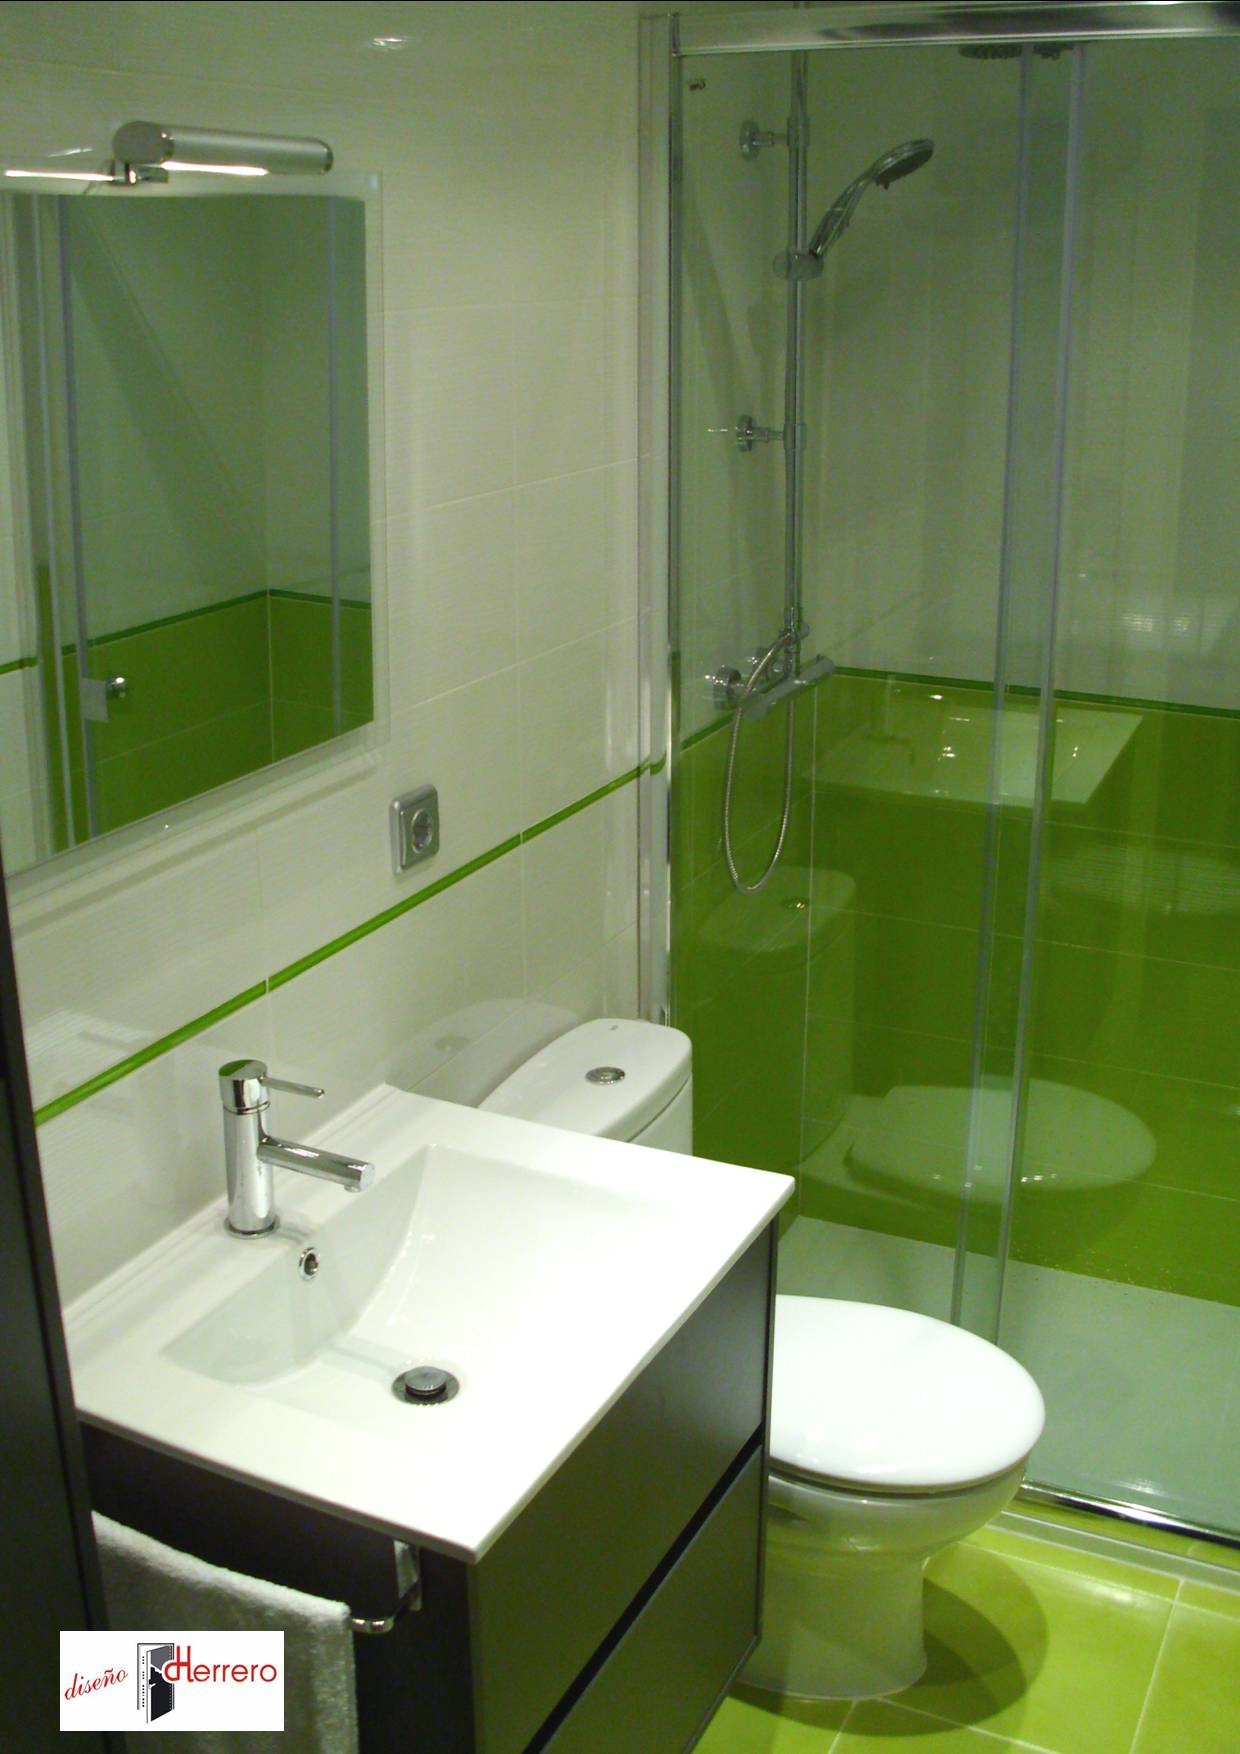 Baño en Zaragoza baño en Zaragoza-6413